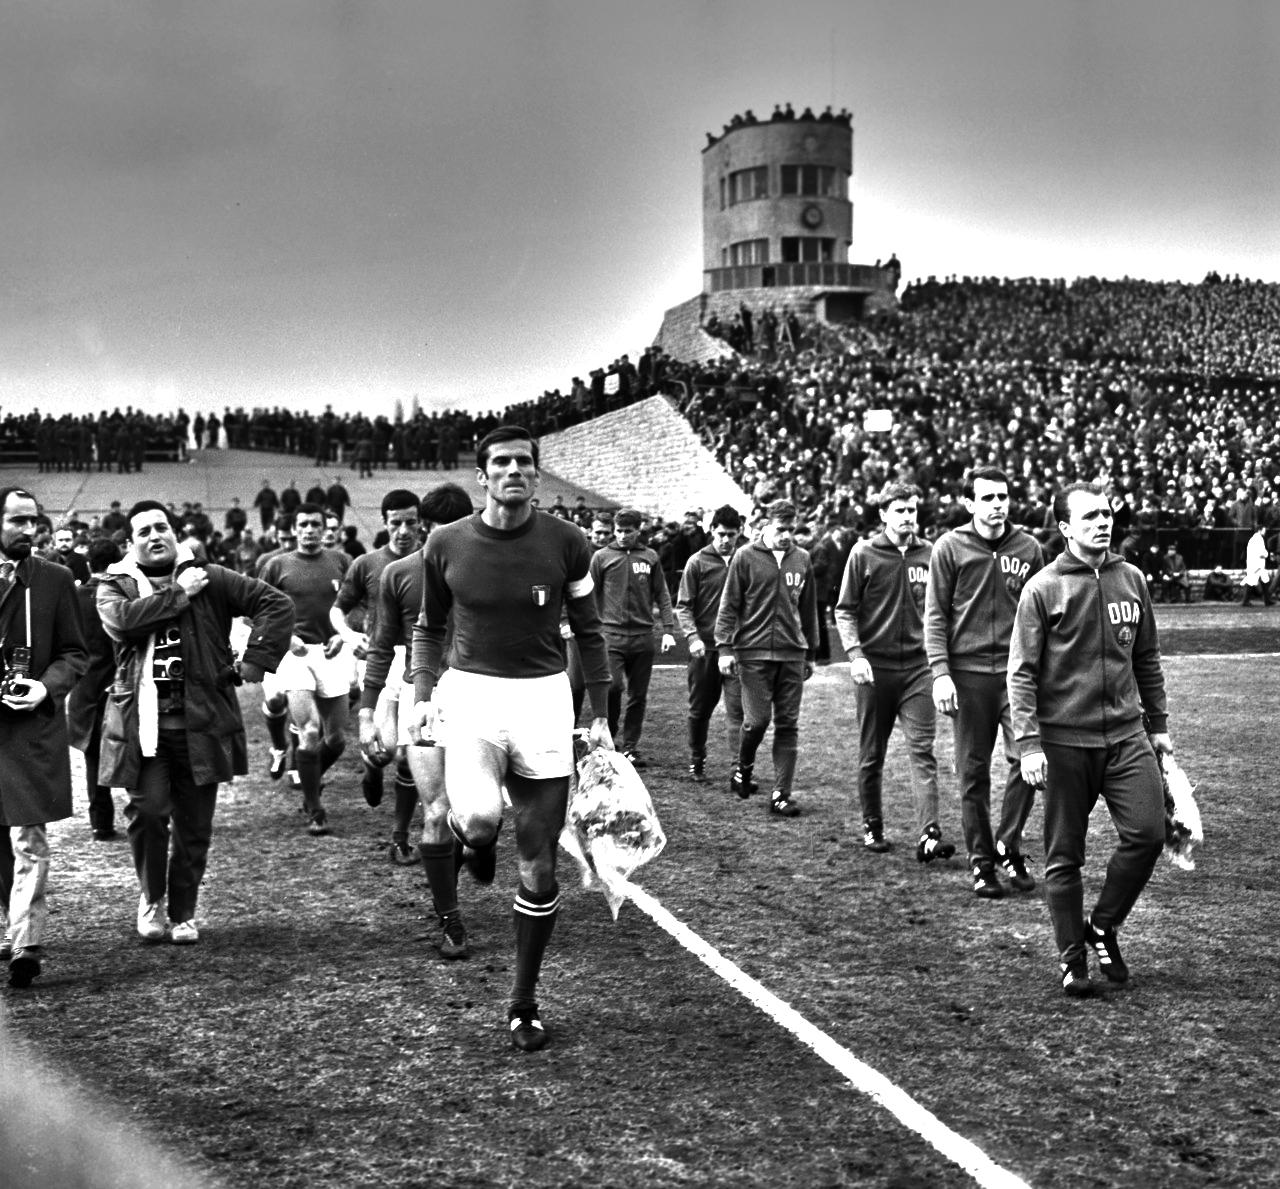 Italy Giacinto Facchetti East Germany Walter Ulbricht Stadion